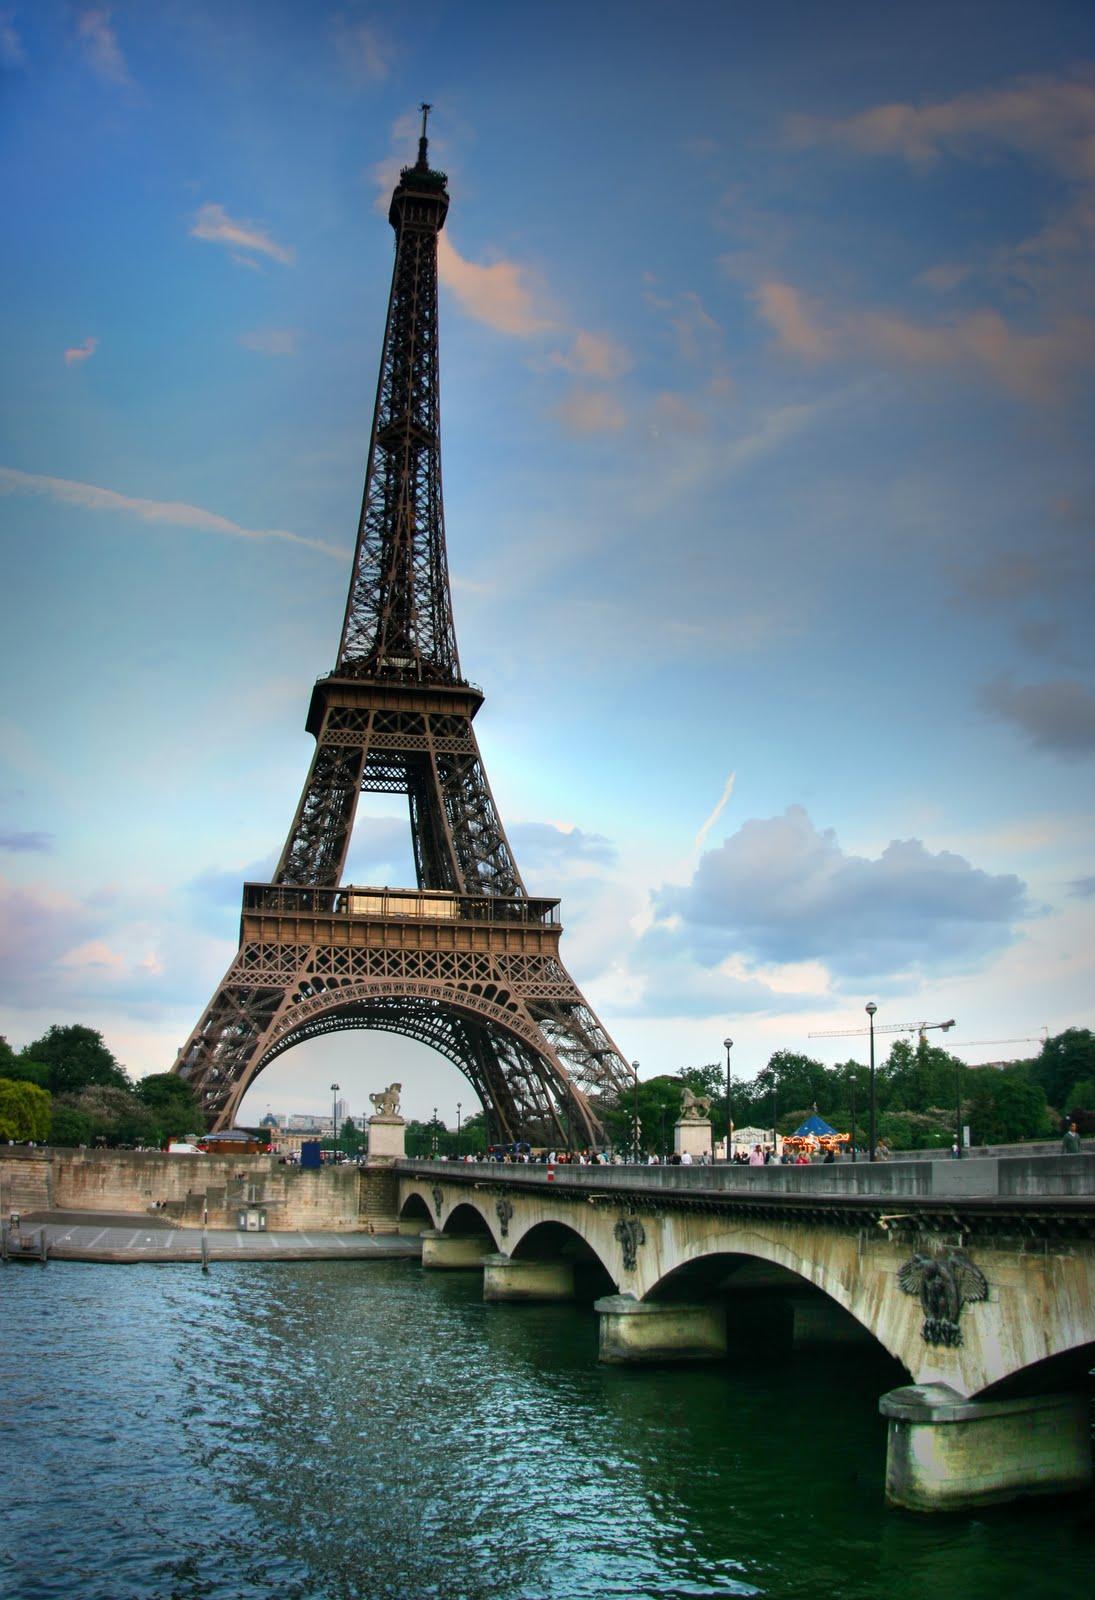 Wallpaper Menara Eiffel : wallpaper, menara, eiffel, Menara, Eiffel, Paris, Tower, 1095x1600, Download, Wallpaper, WallpaperTip